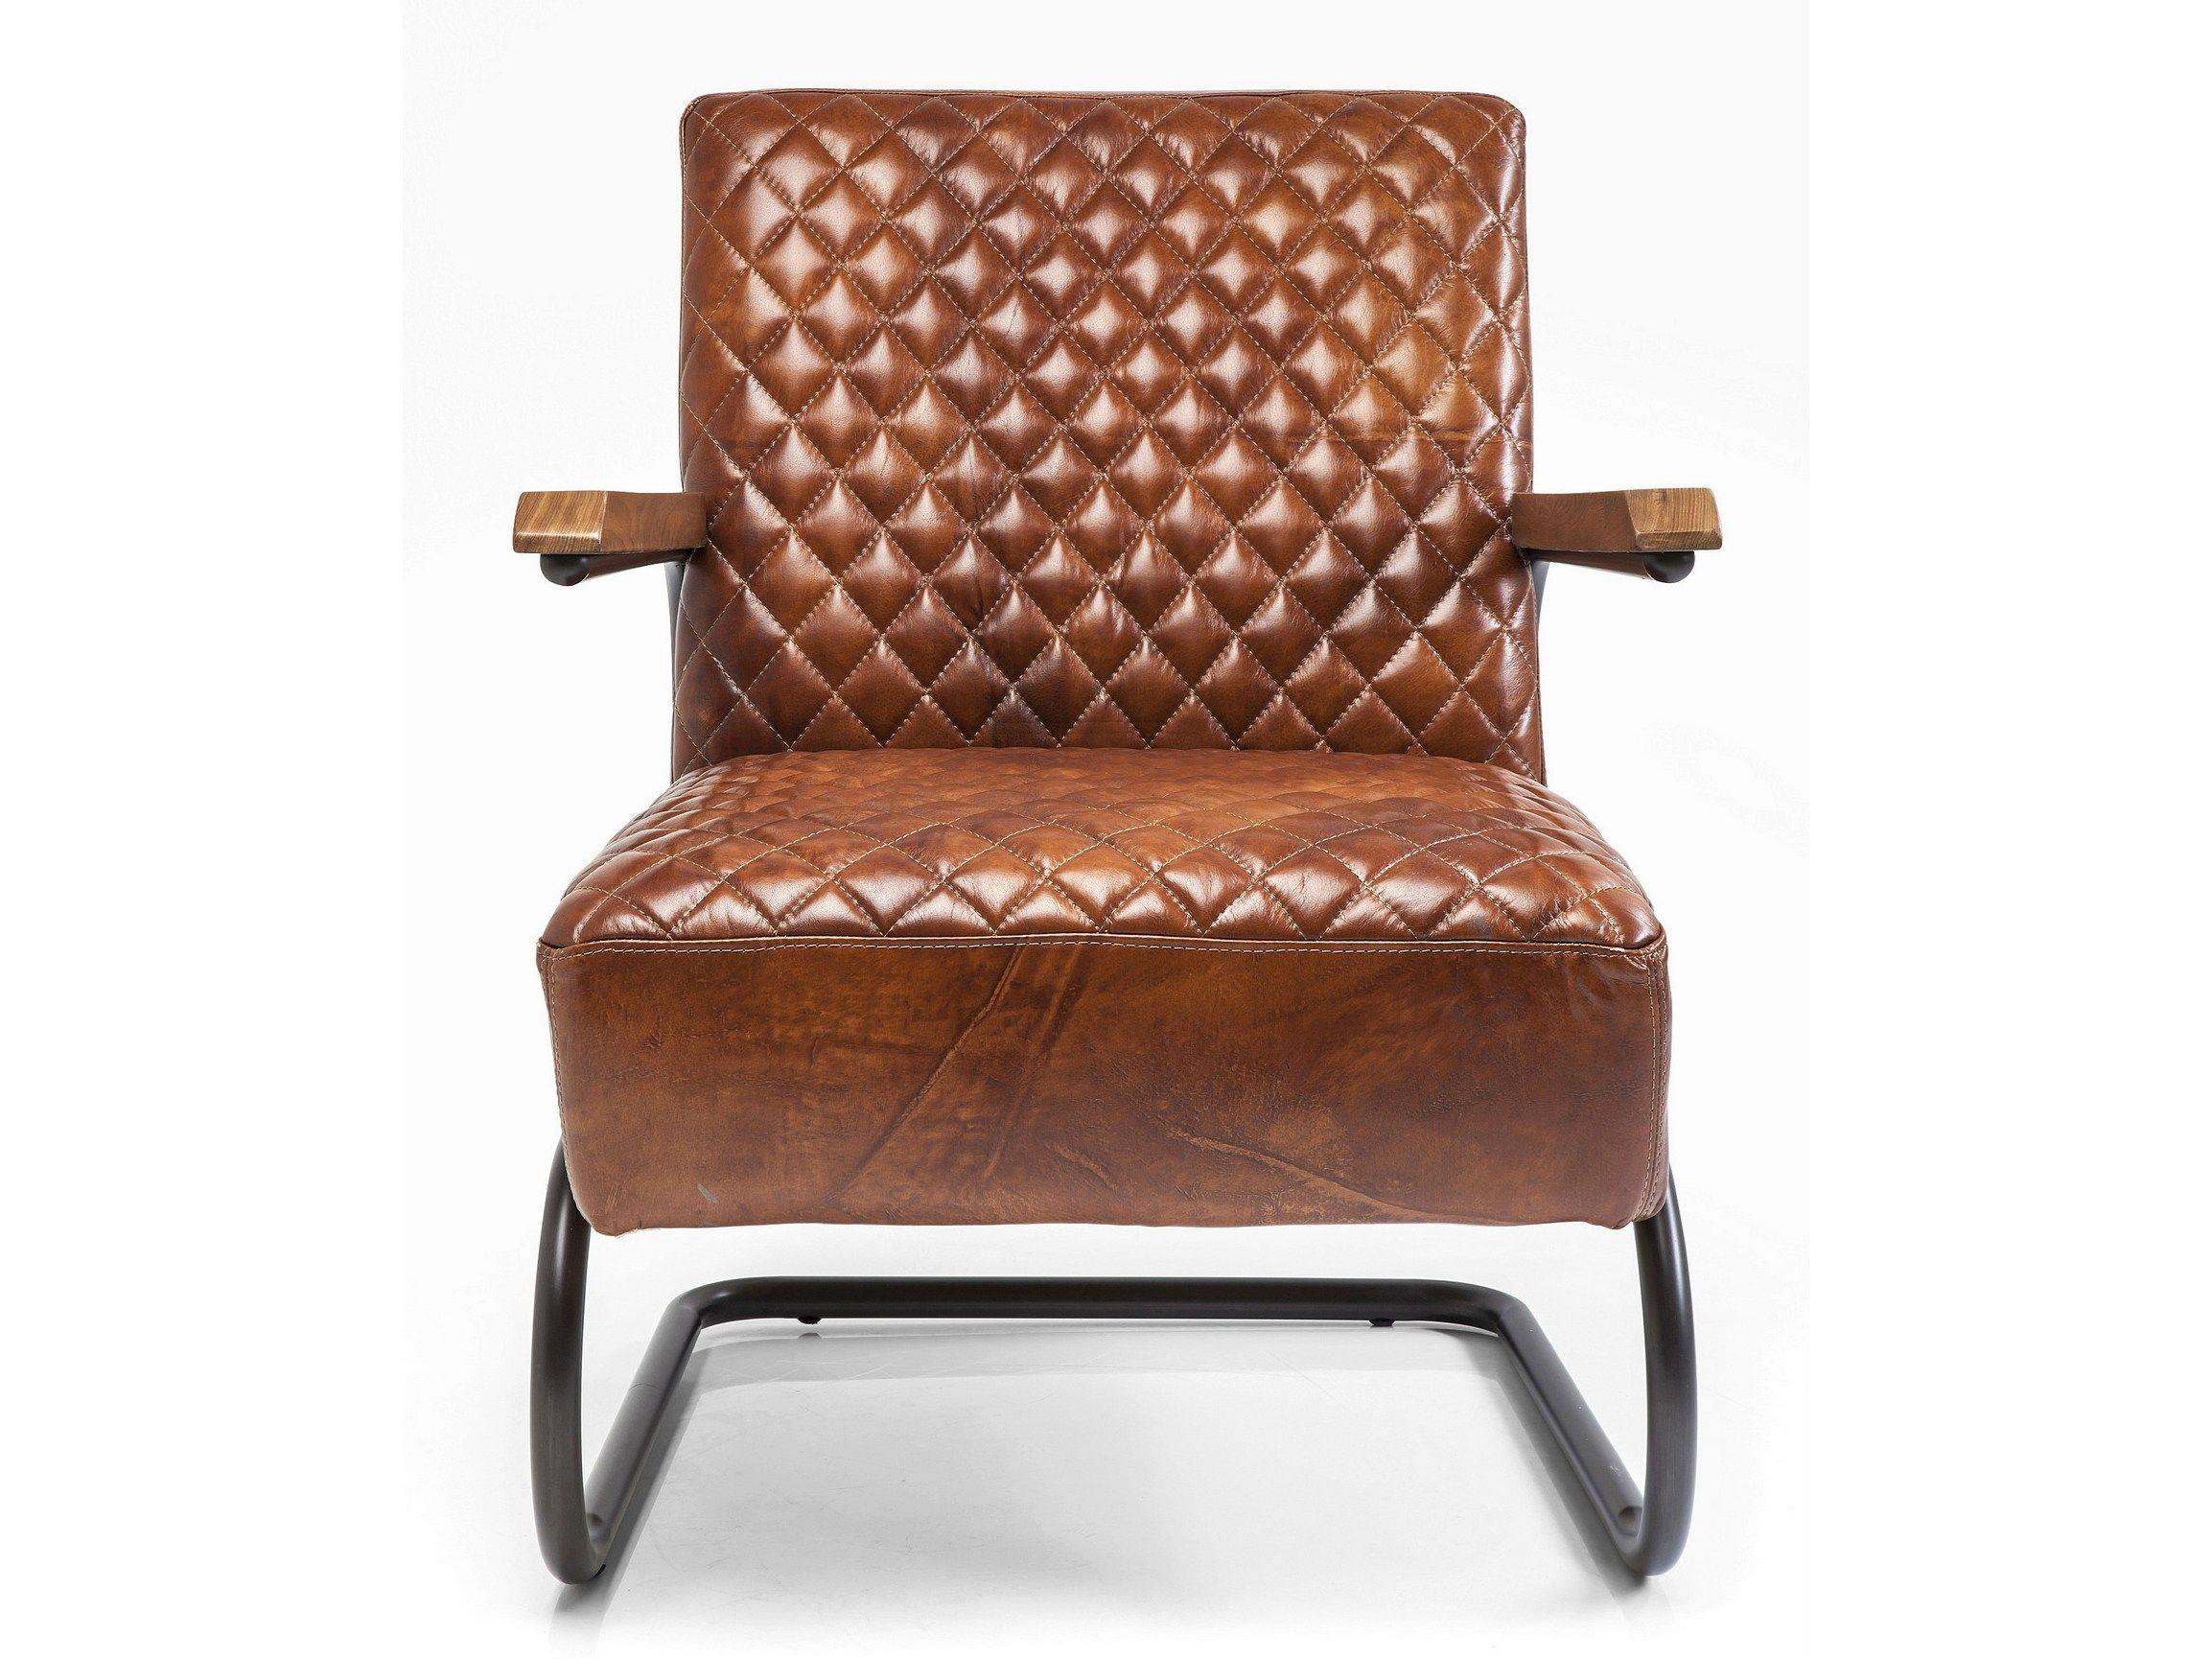 Kare Design Bank fauteuil patchwork kare design simple fauteuil kare design frais